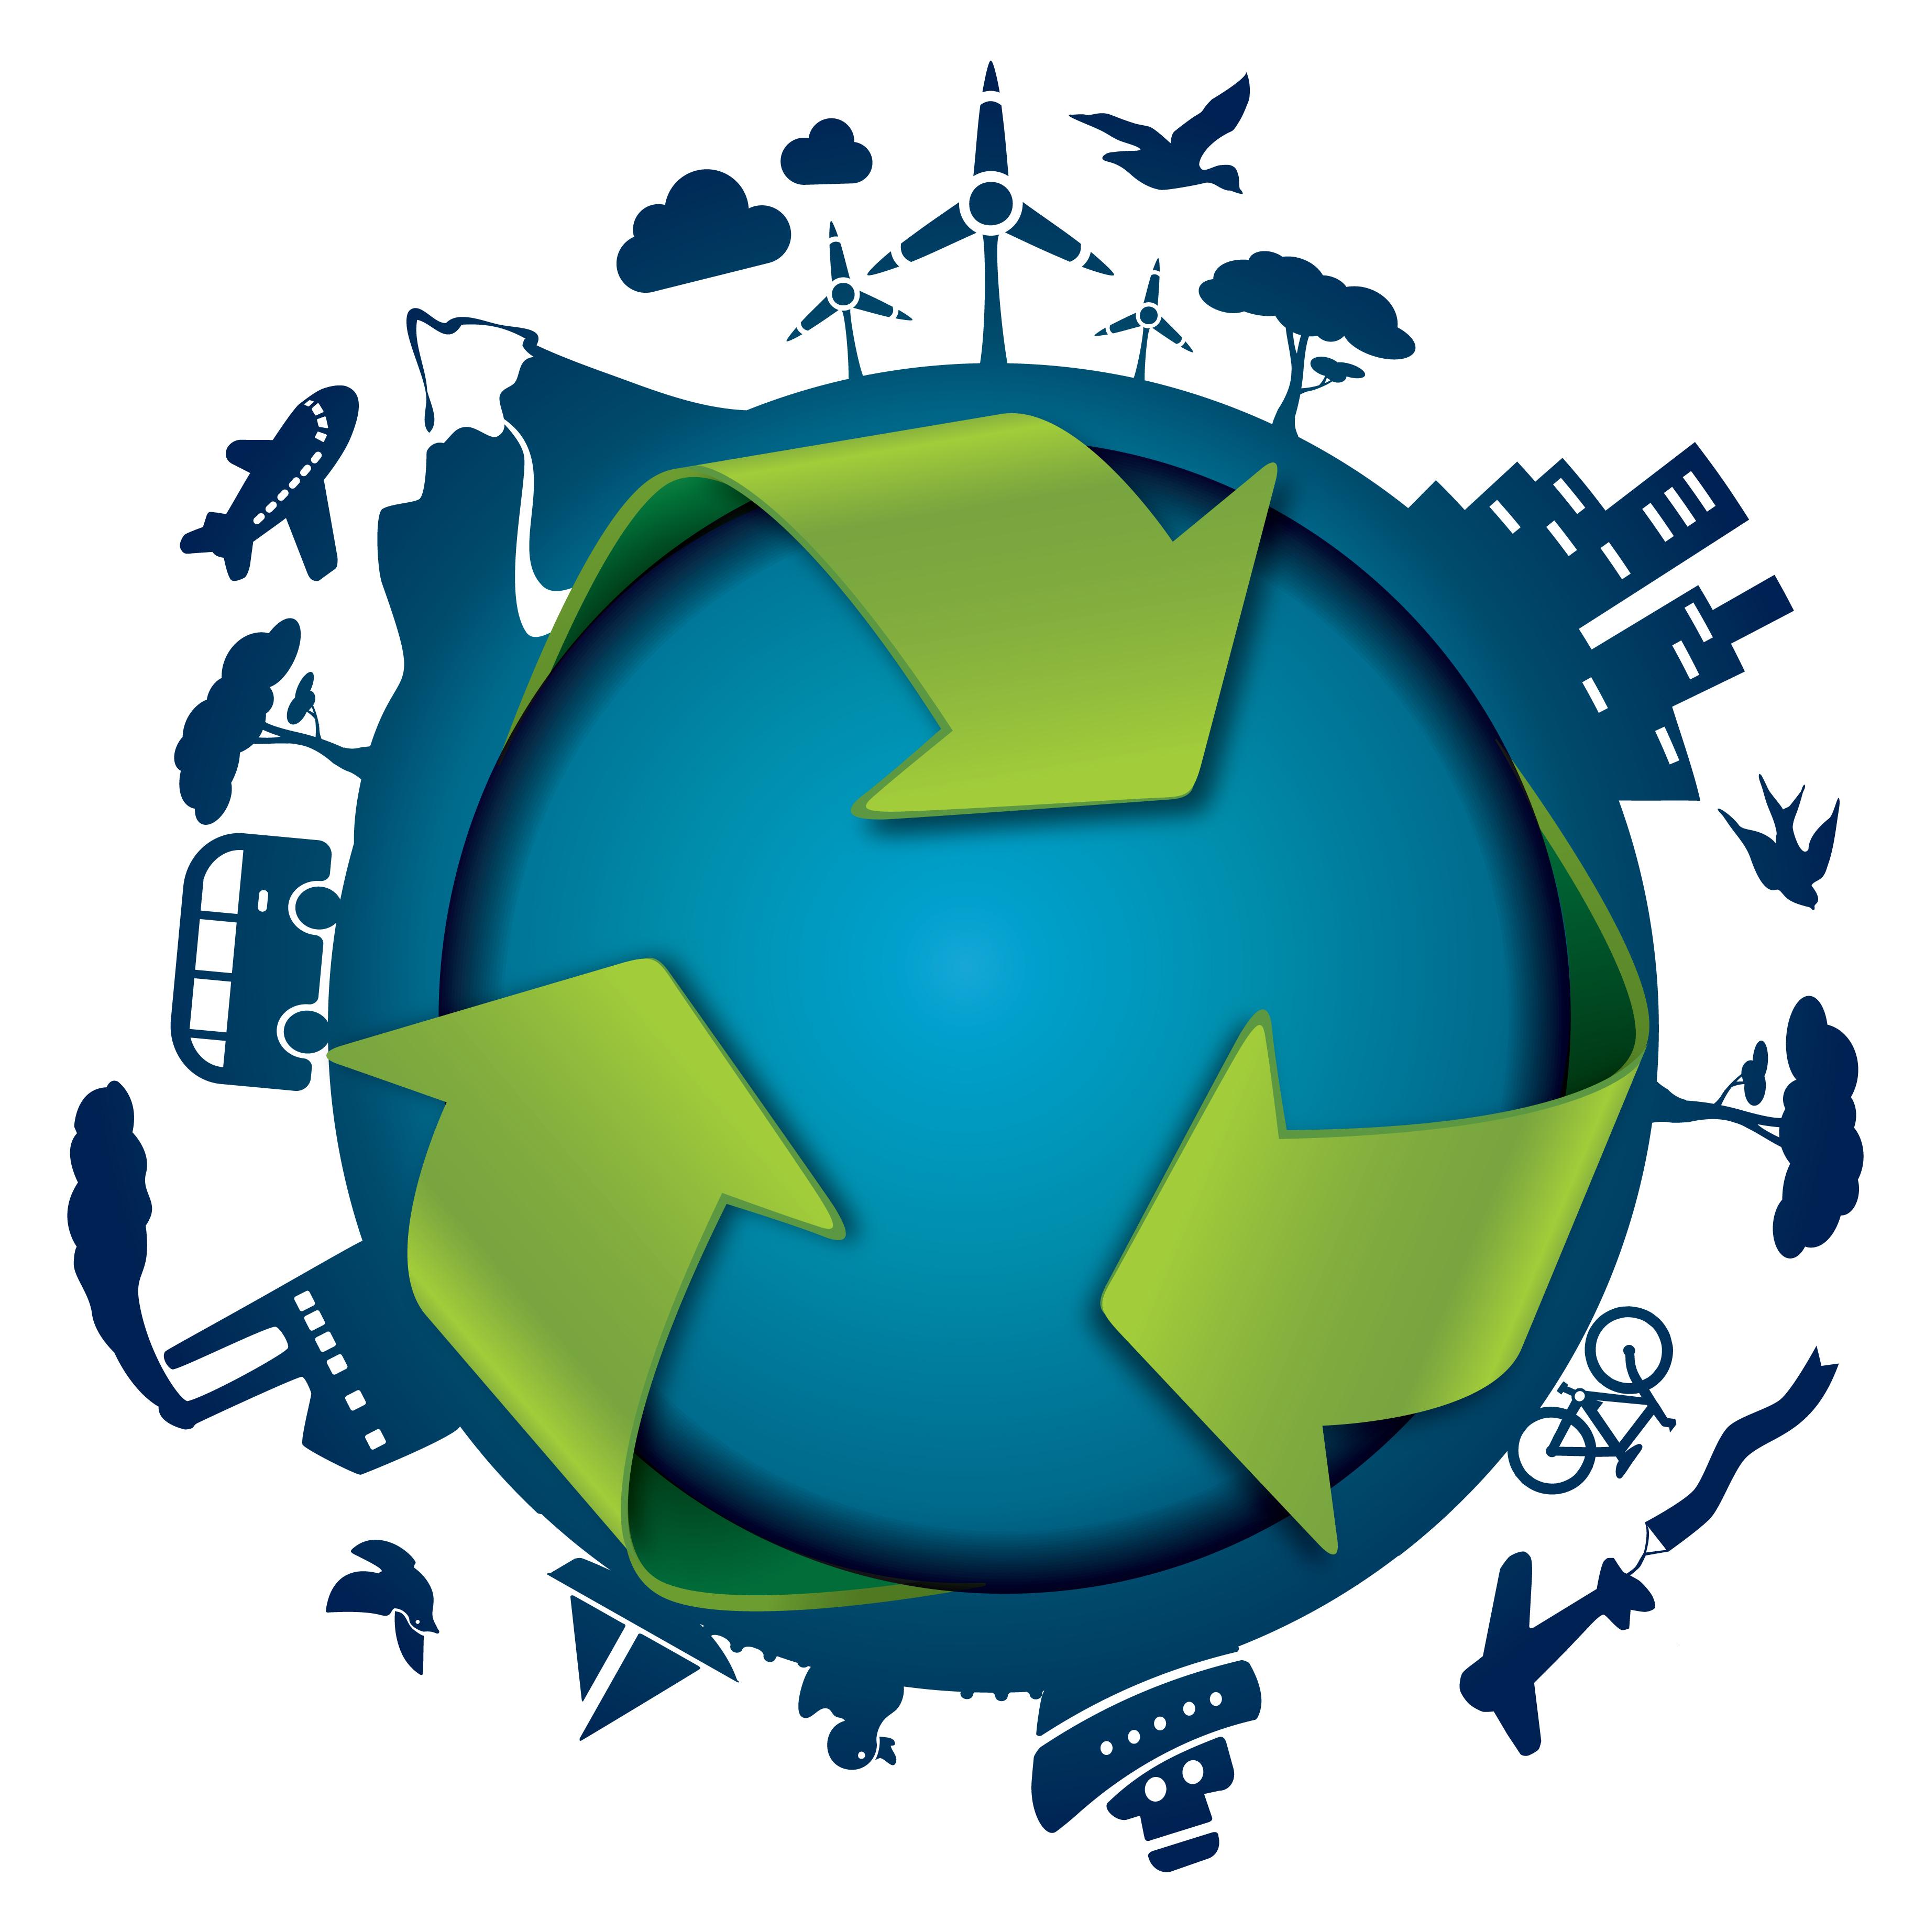 Illustration of circular economy - © Bup / Shutterstock.com